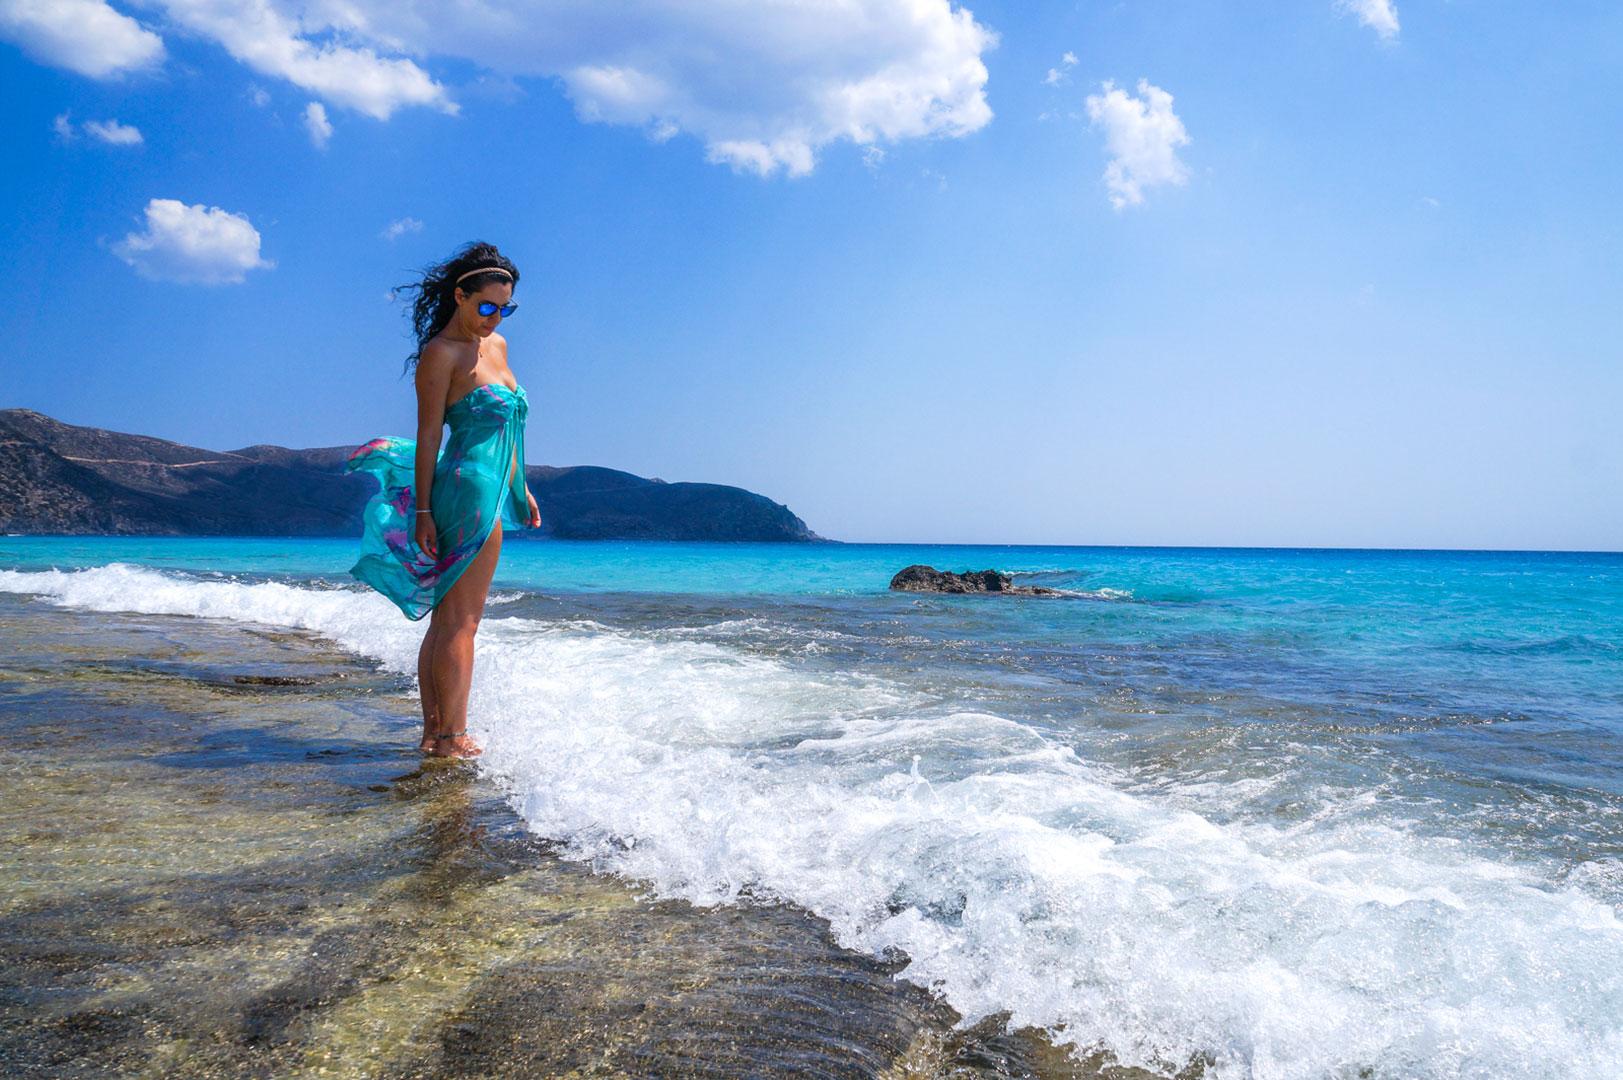 kedrodasos-chania-crete-greece-la-vie-en-blog-all-rights-reserved-3